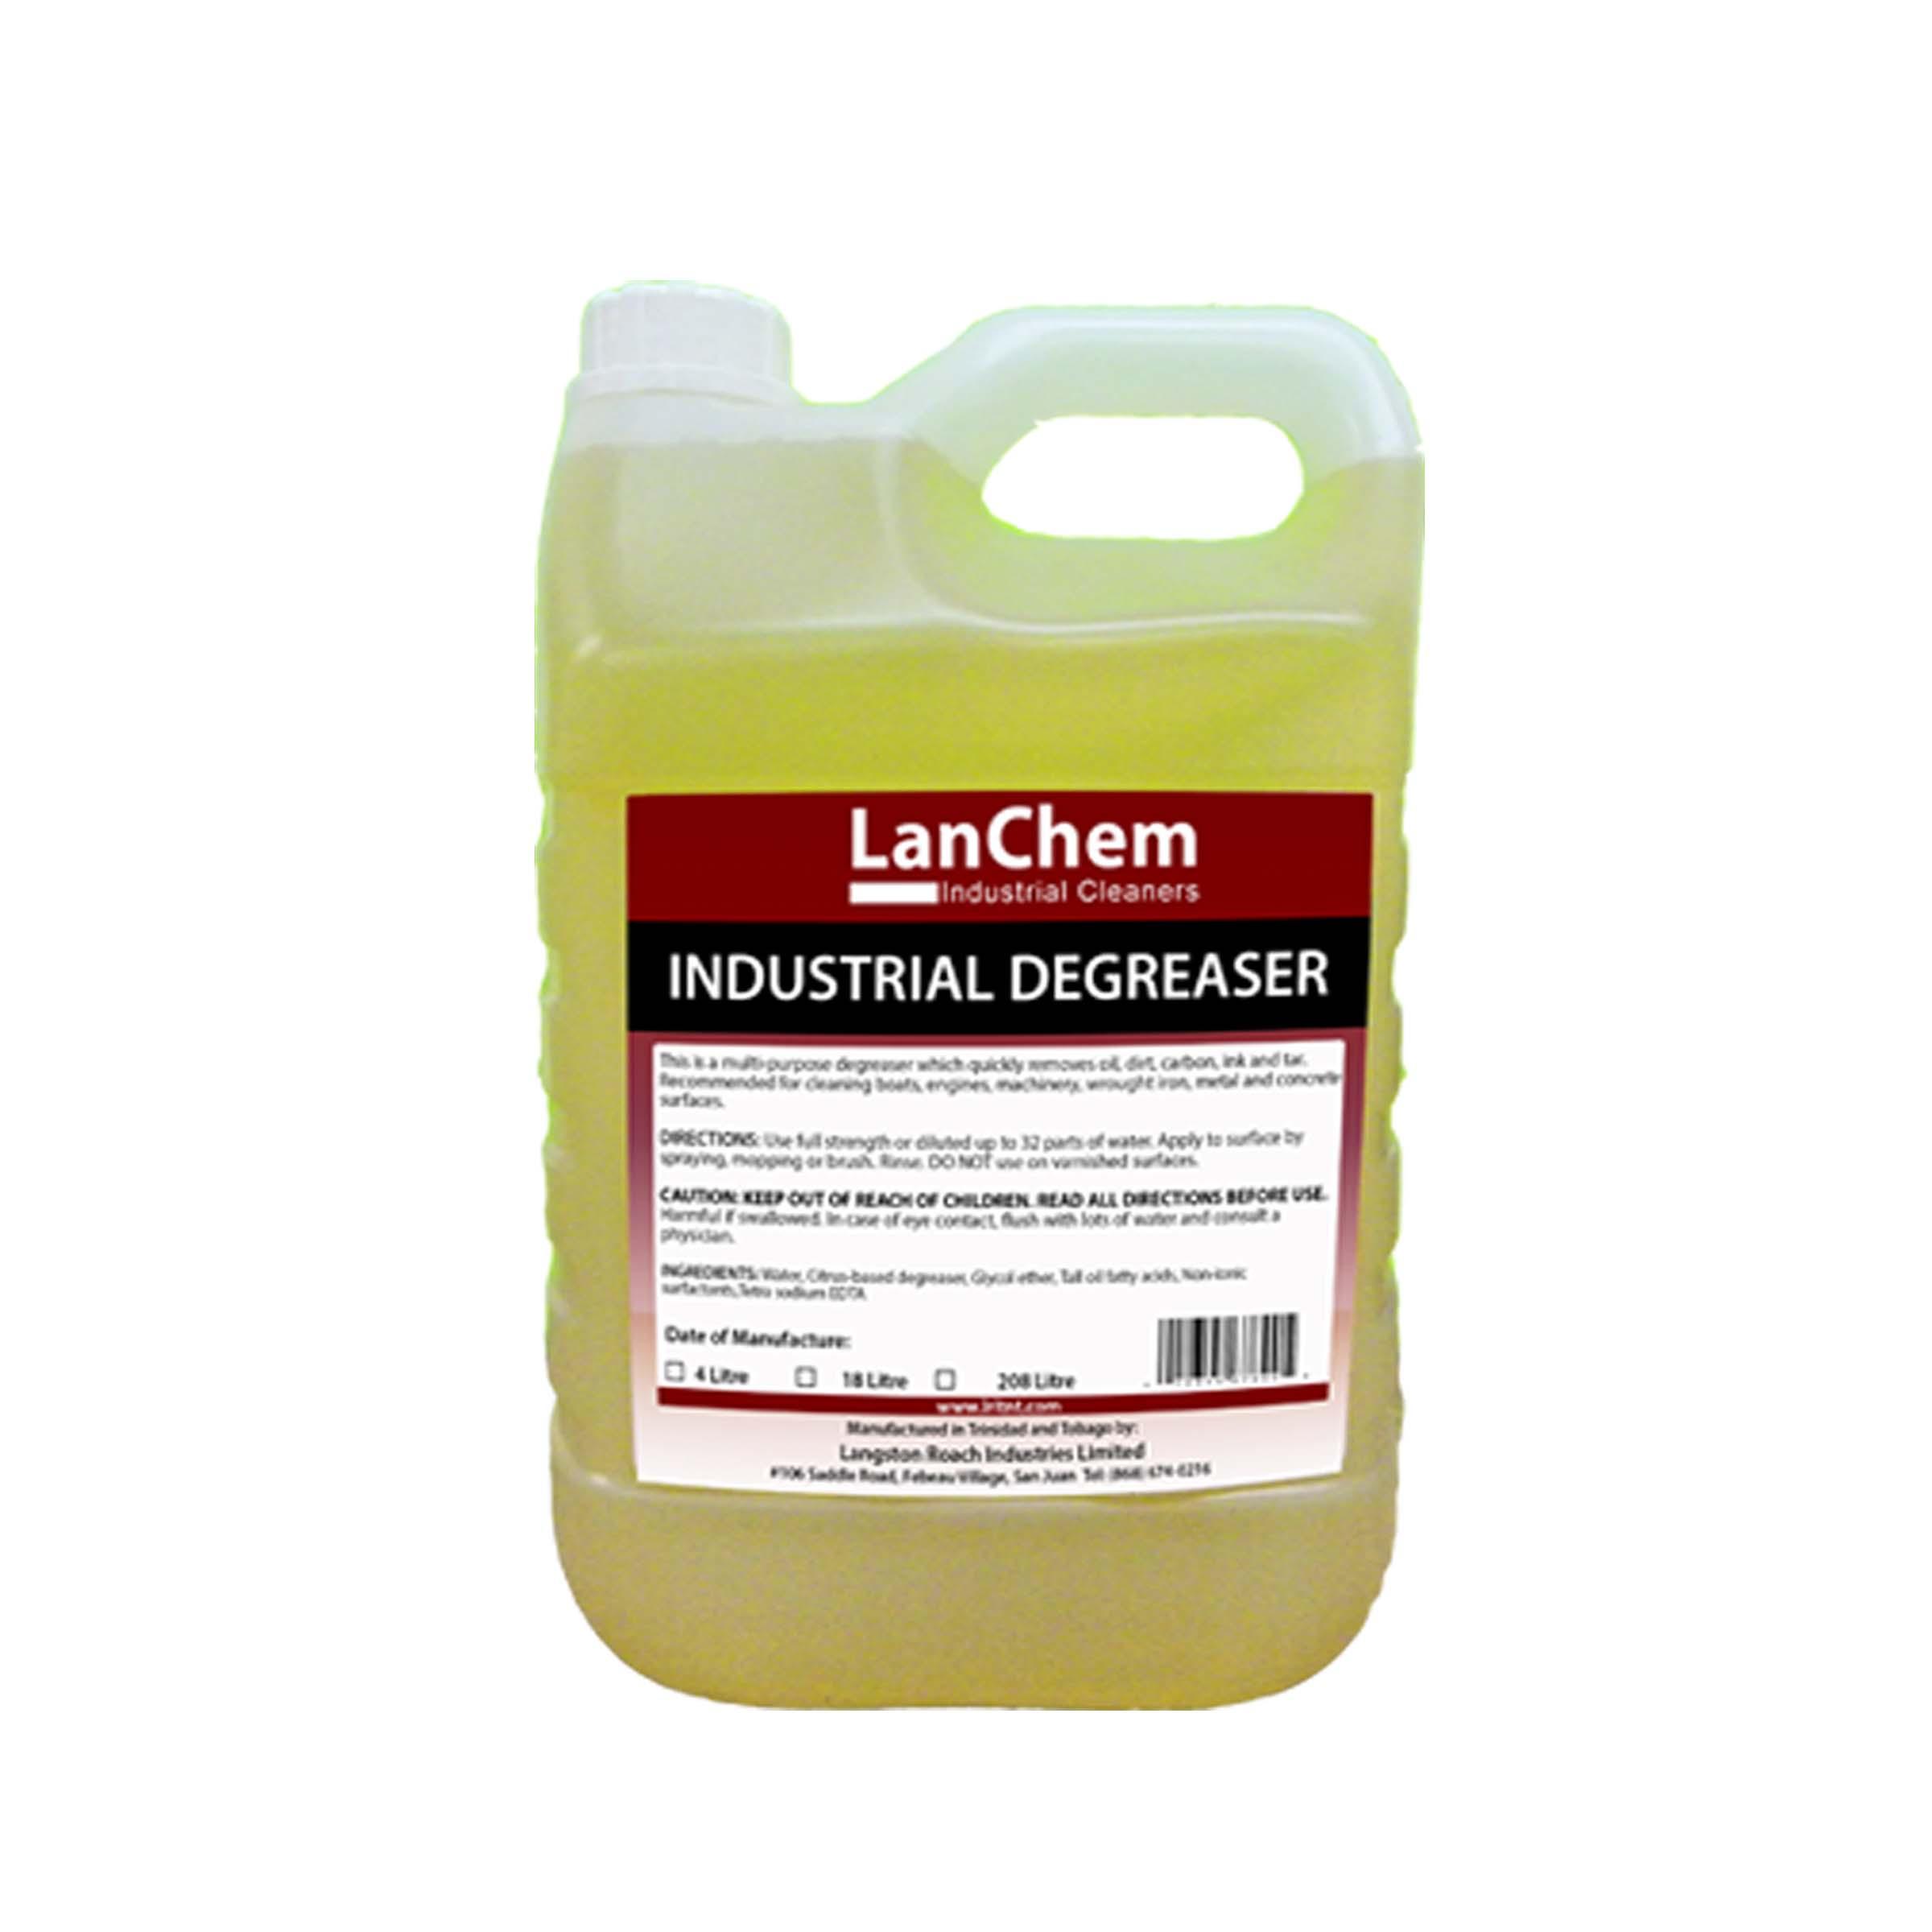 Bathroom, Tub & Tile Cleaner – Langston Roach Industries Limited